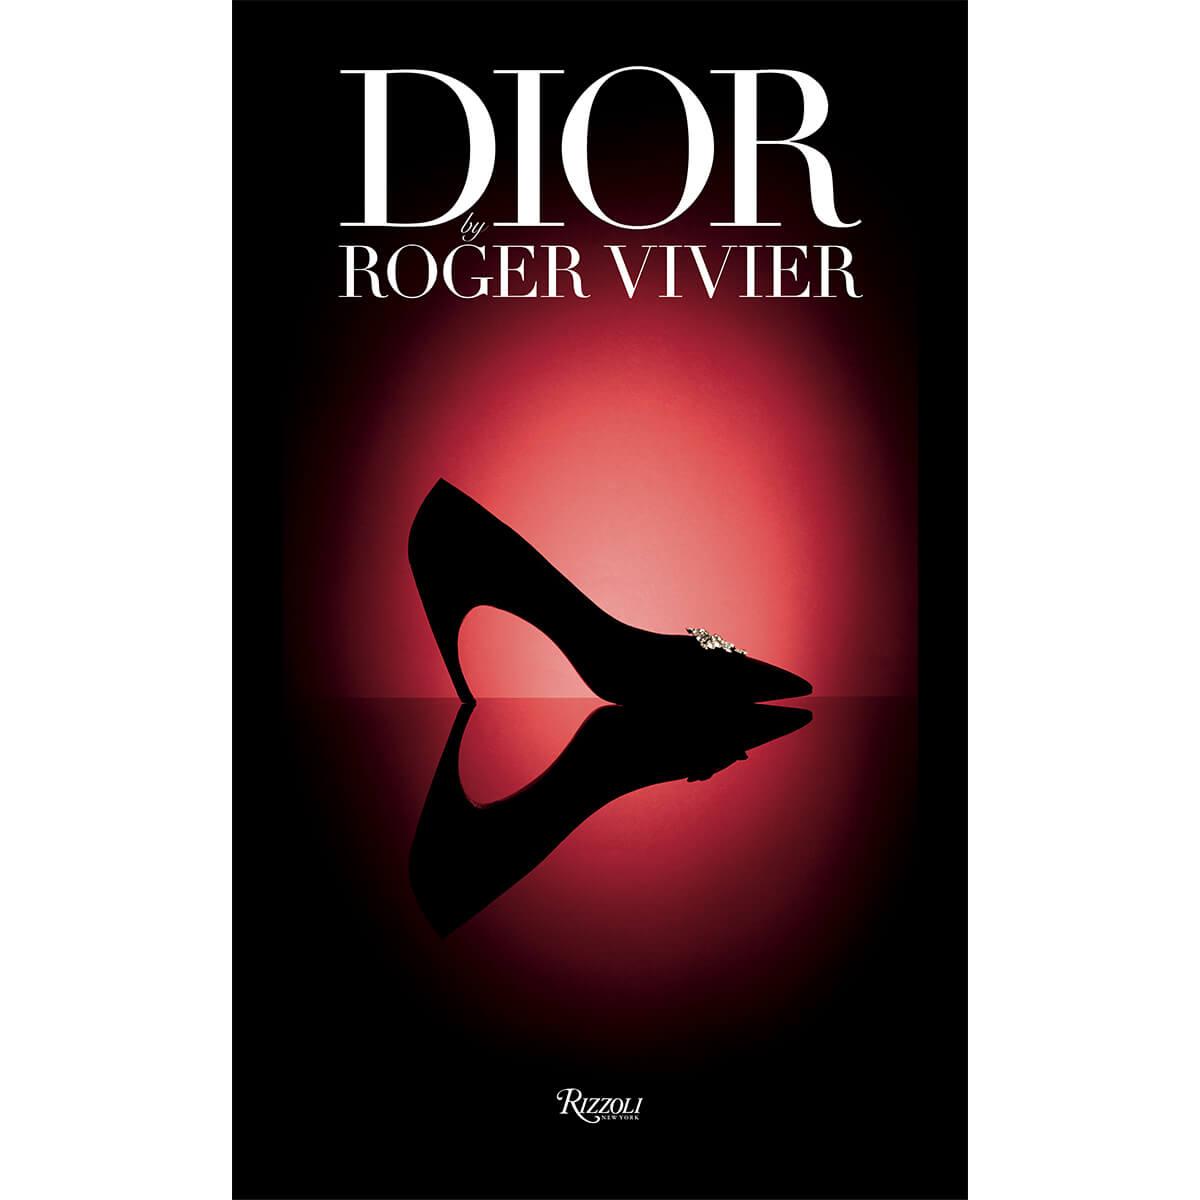 dior-by-roger-vivier